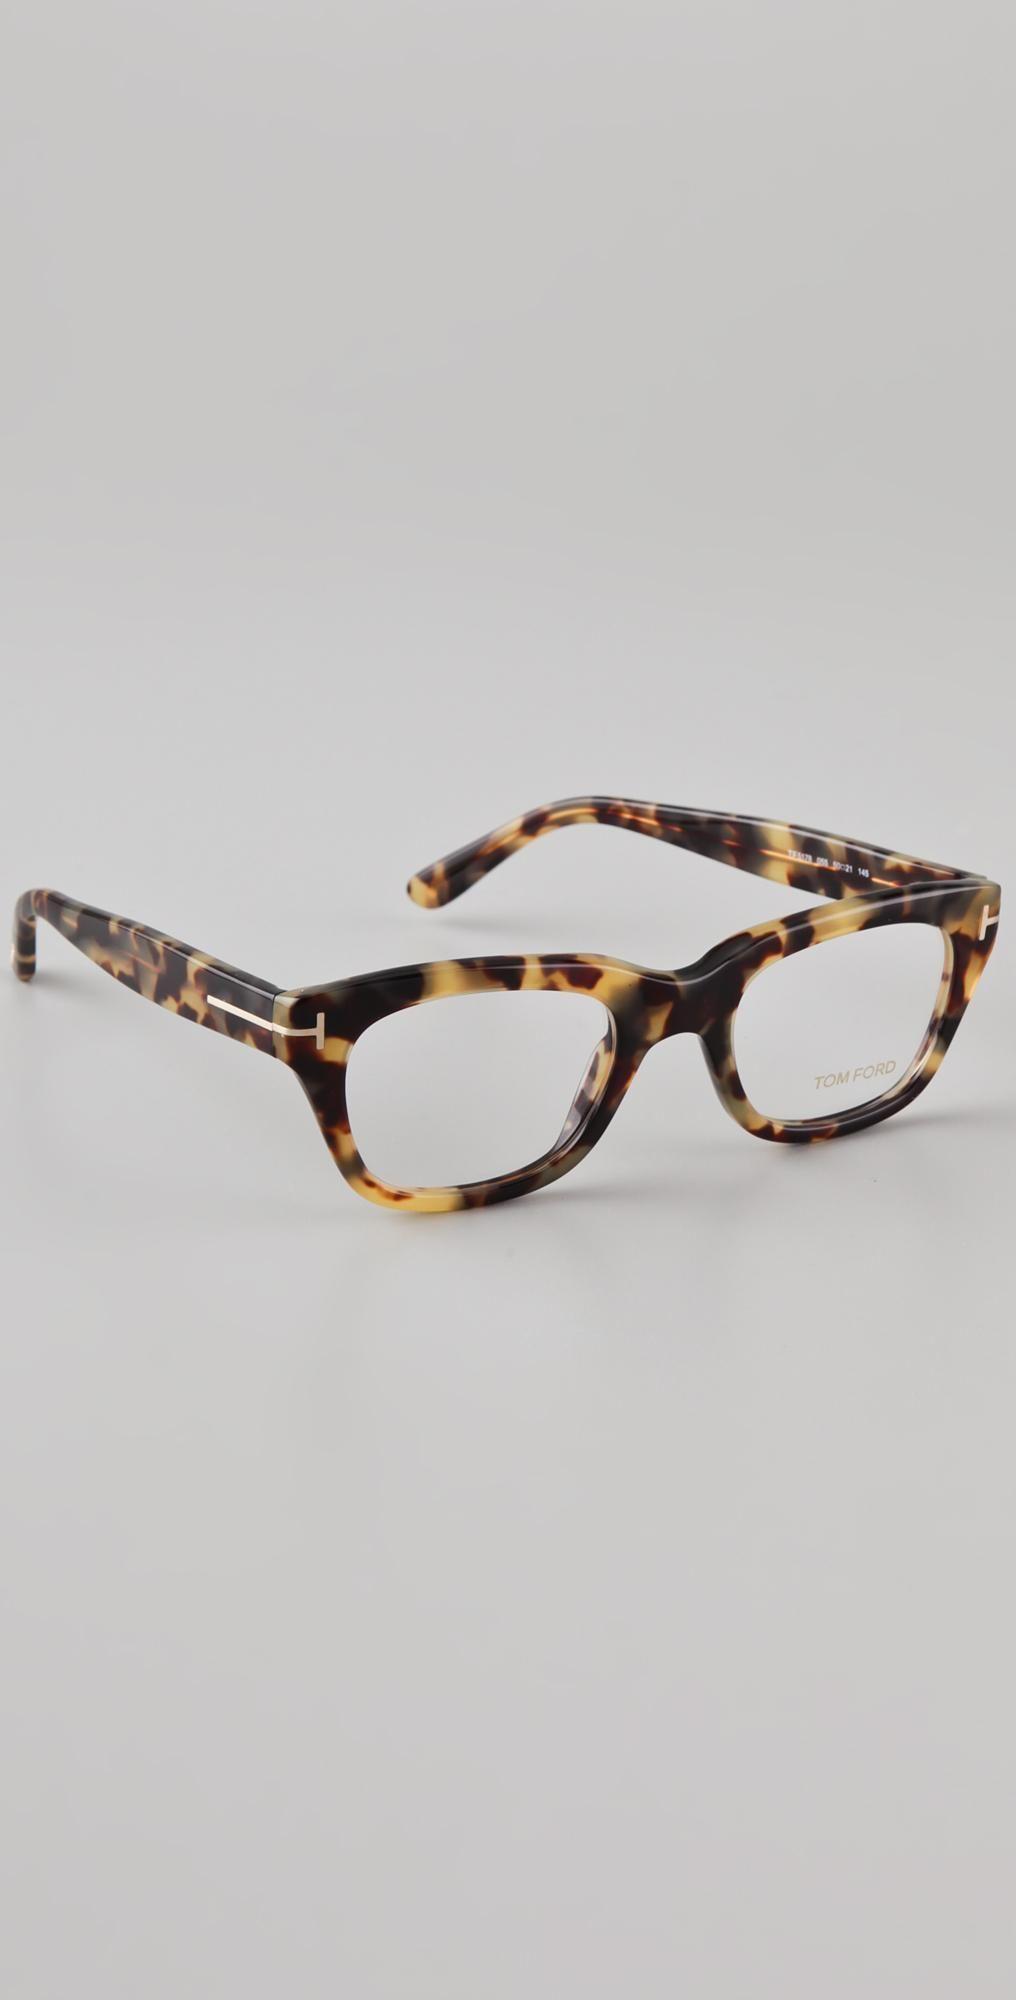 8c61fccb3a Tom Ford Eyewear Square Glasses Anteojos, Gafas, Cuatro Ojos, Estilo, Moda,